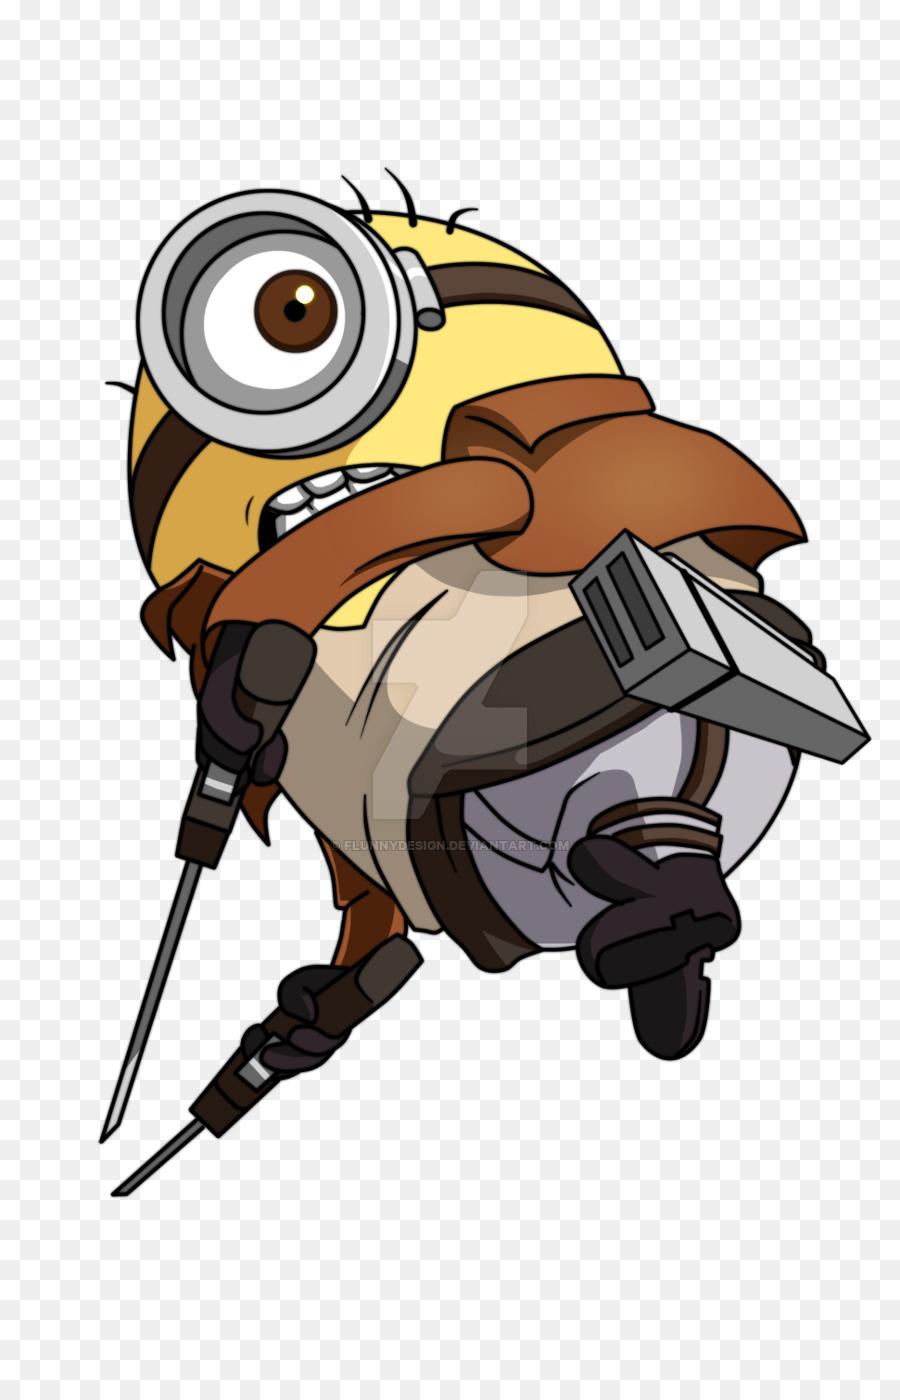 Attack Titan Animasi Kartun Despicable Film Pelayan Unduh Gambar Minion